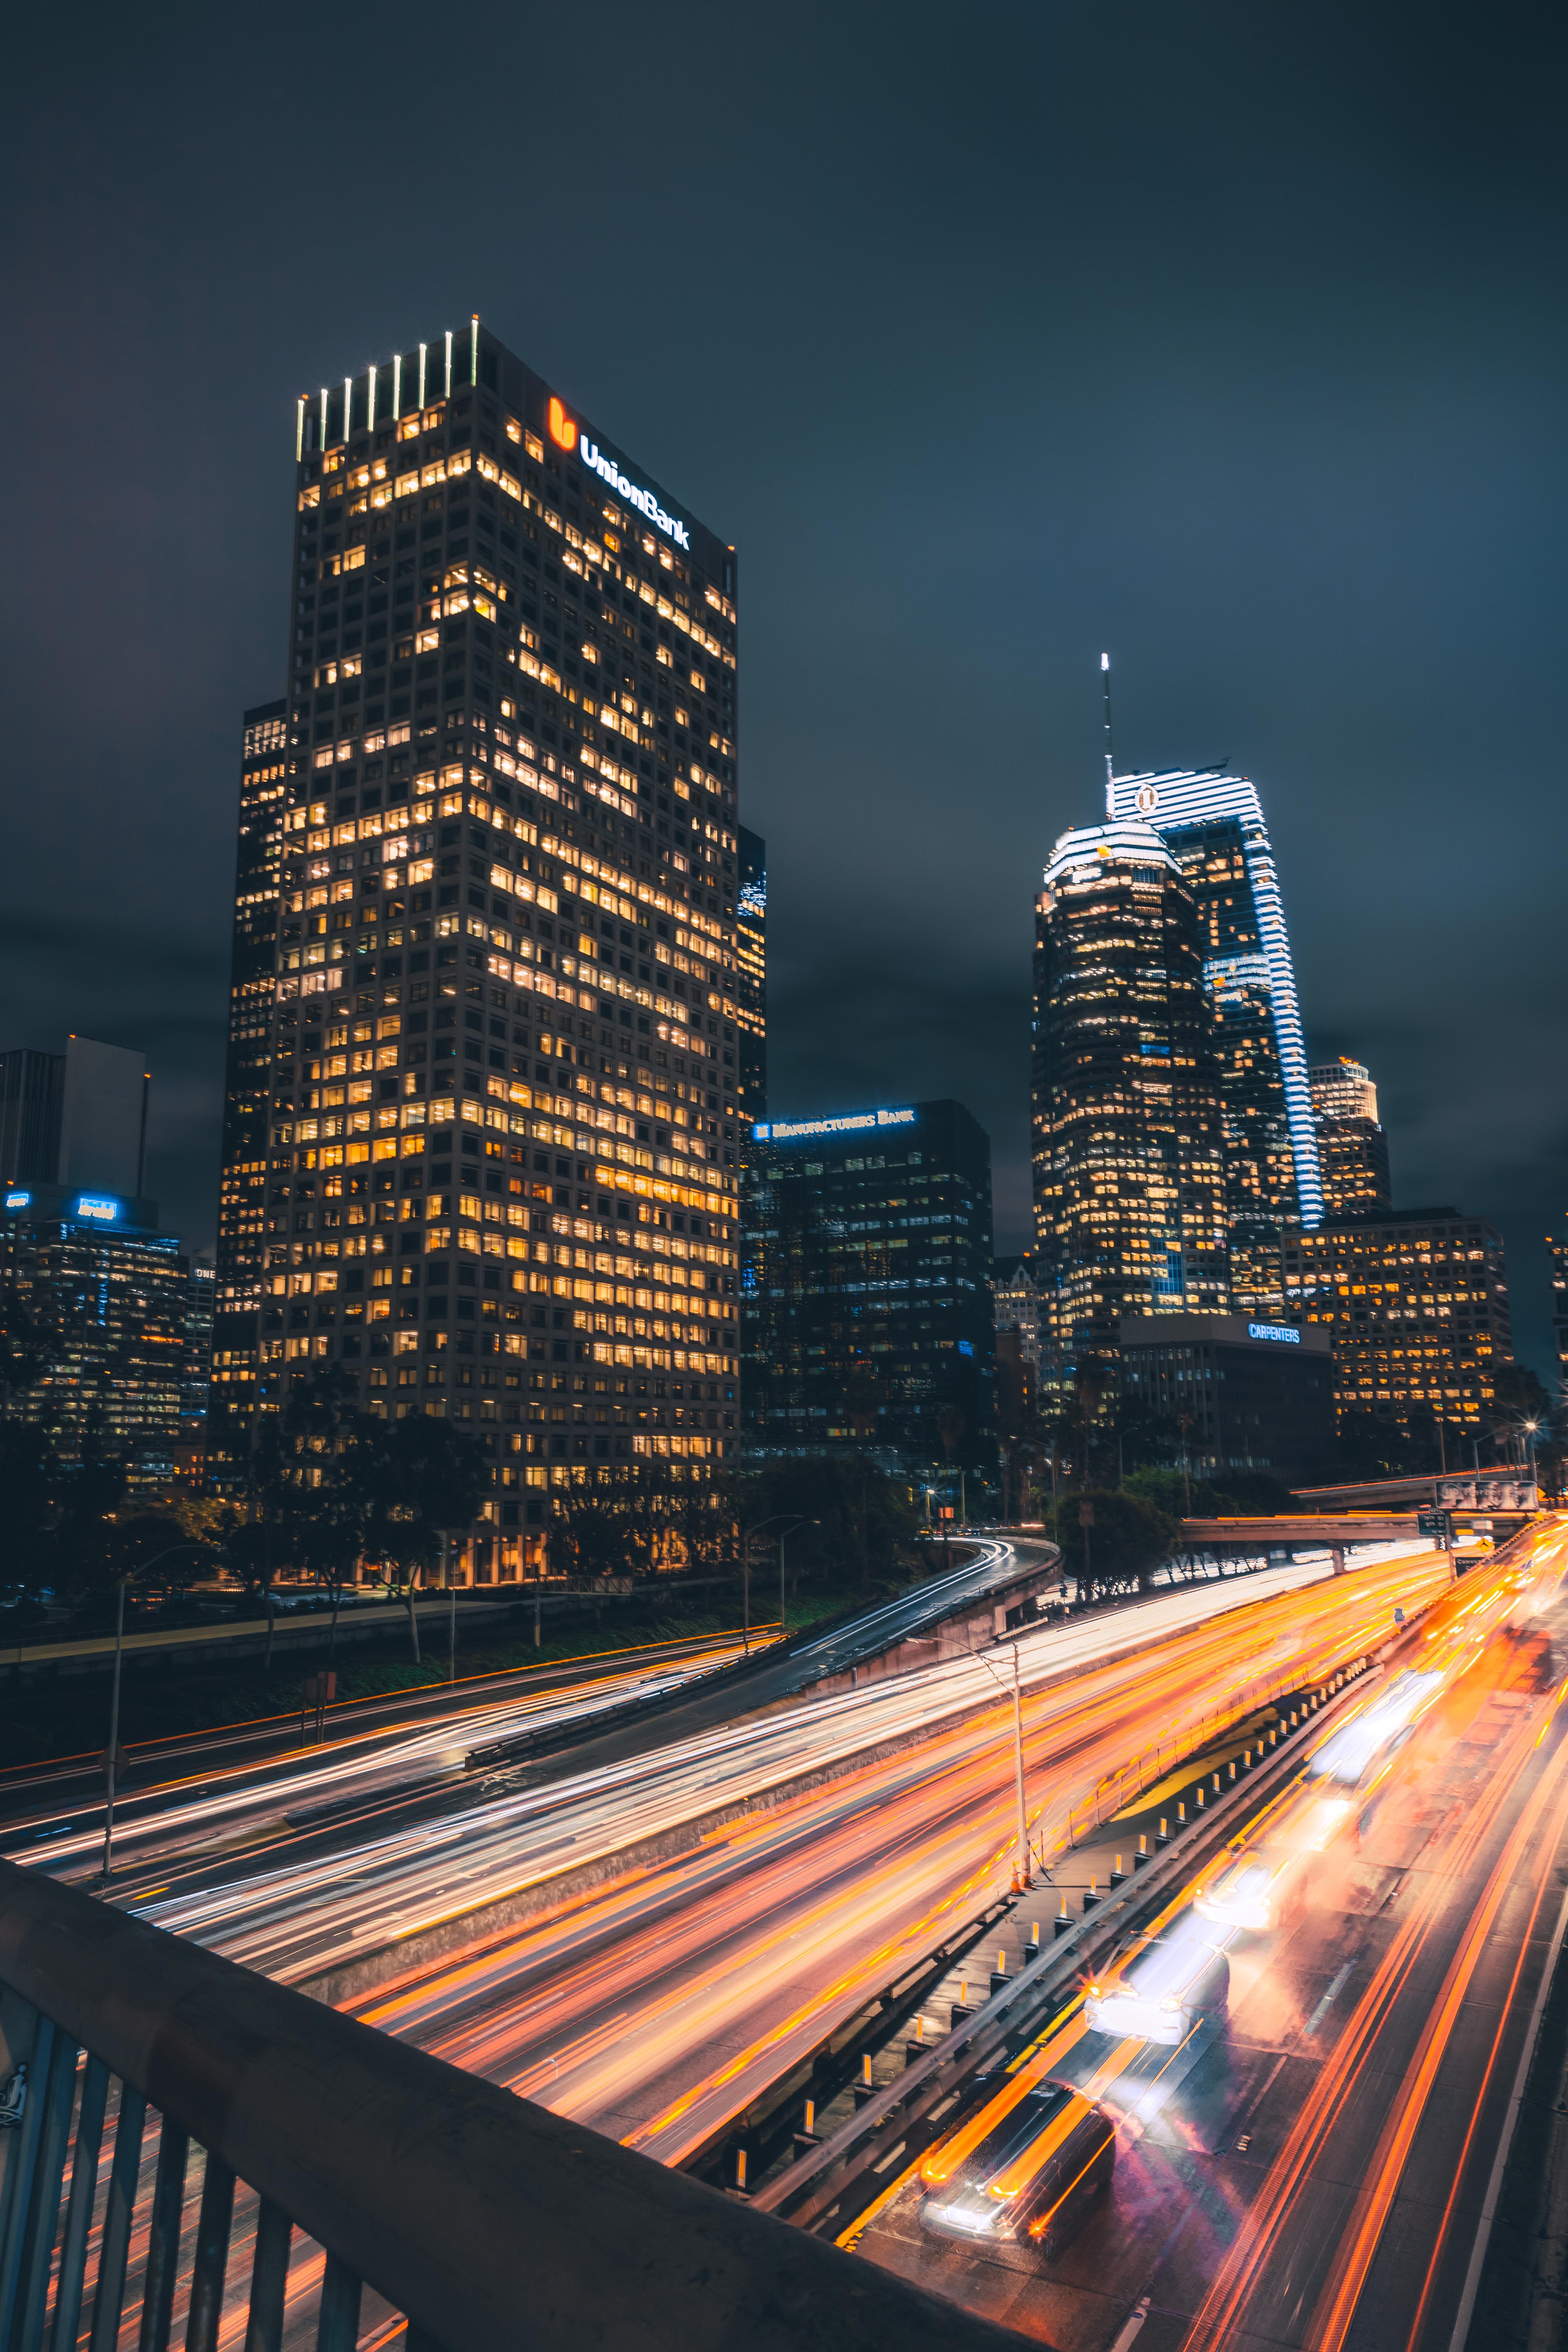 Time-Lapse Photo of Expressway During Night